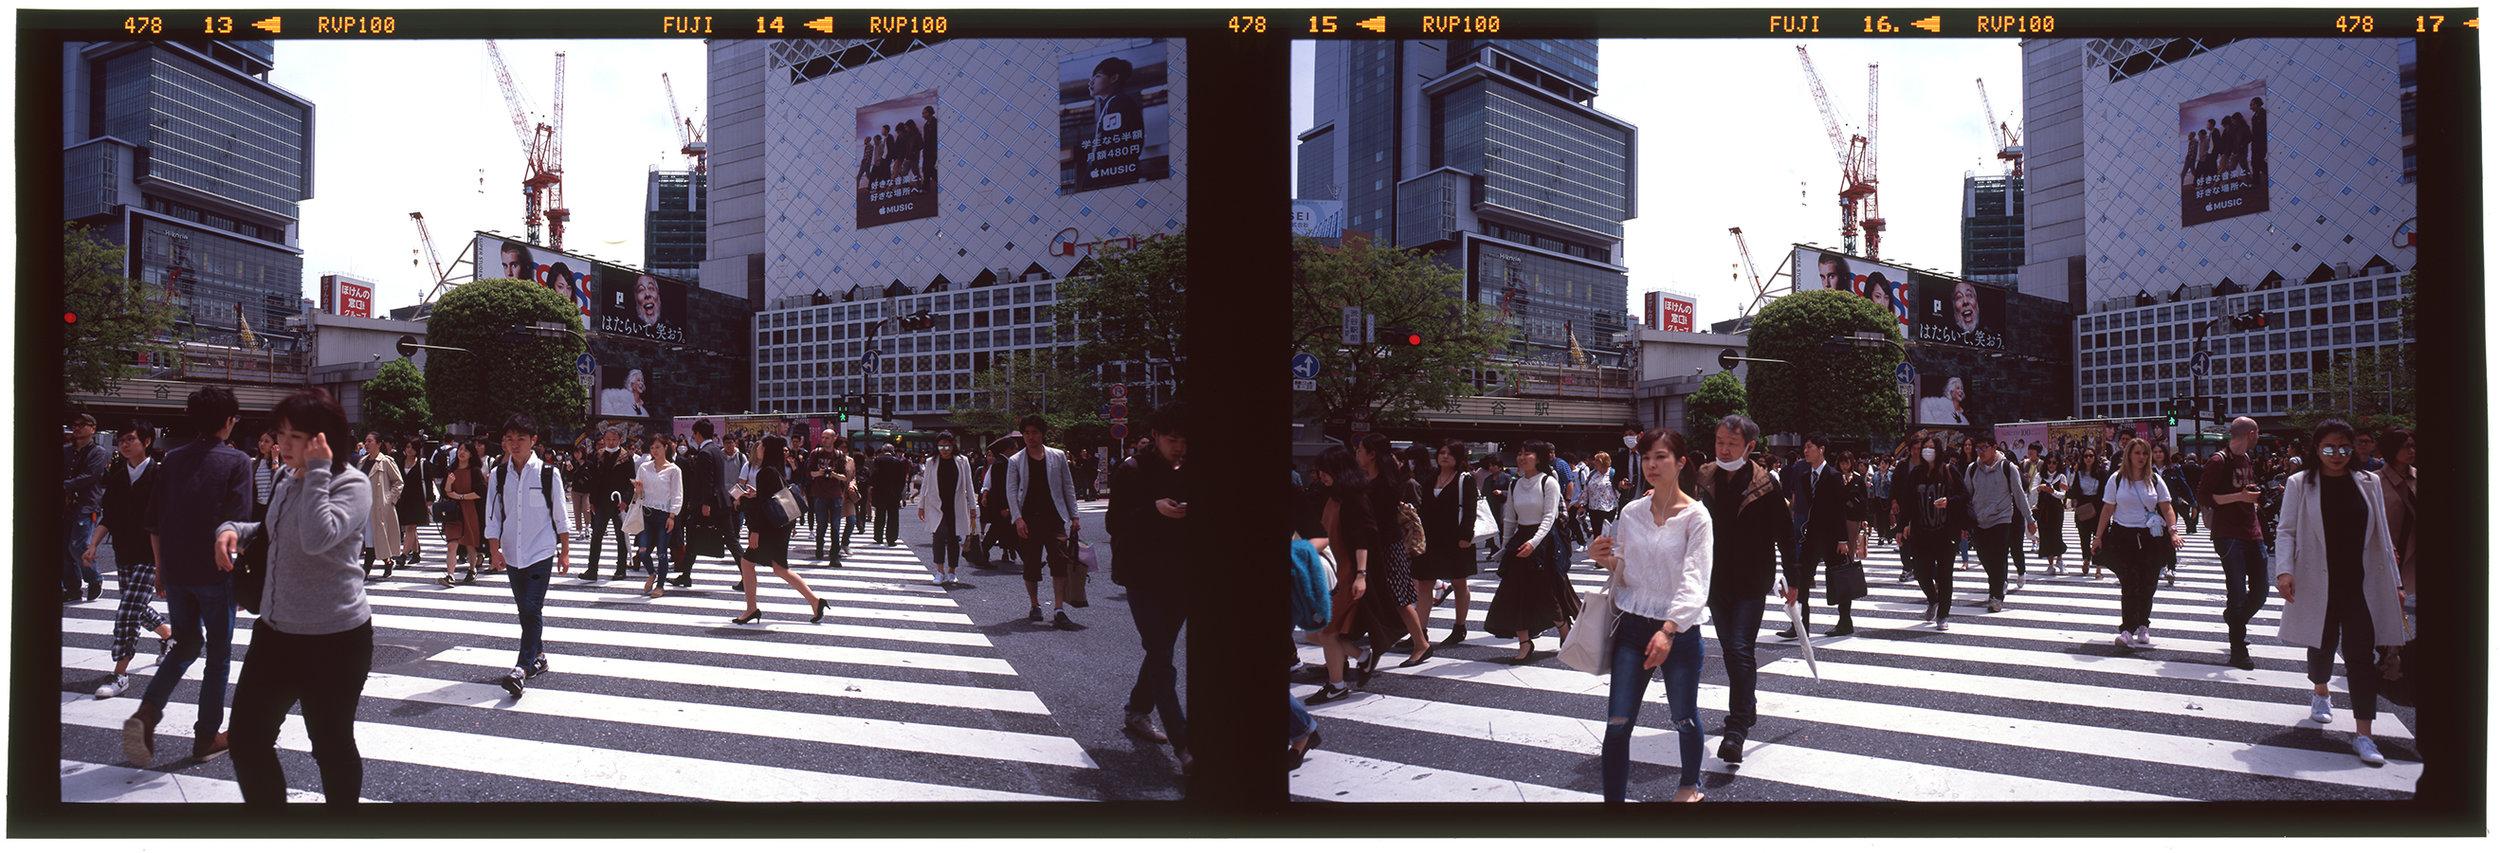 SHIBUYA CROSSING, TOKYO, 2017